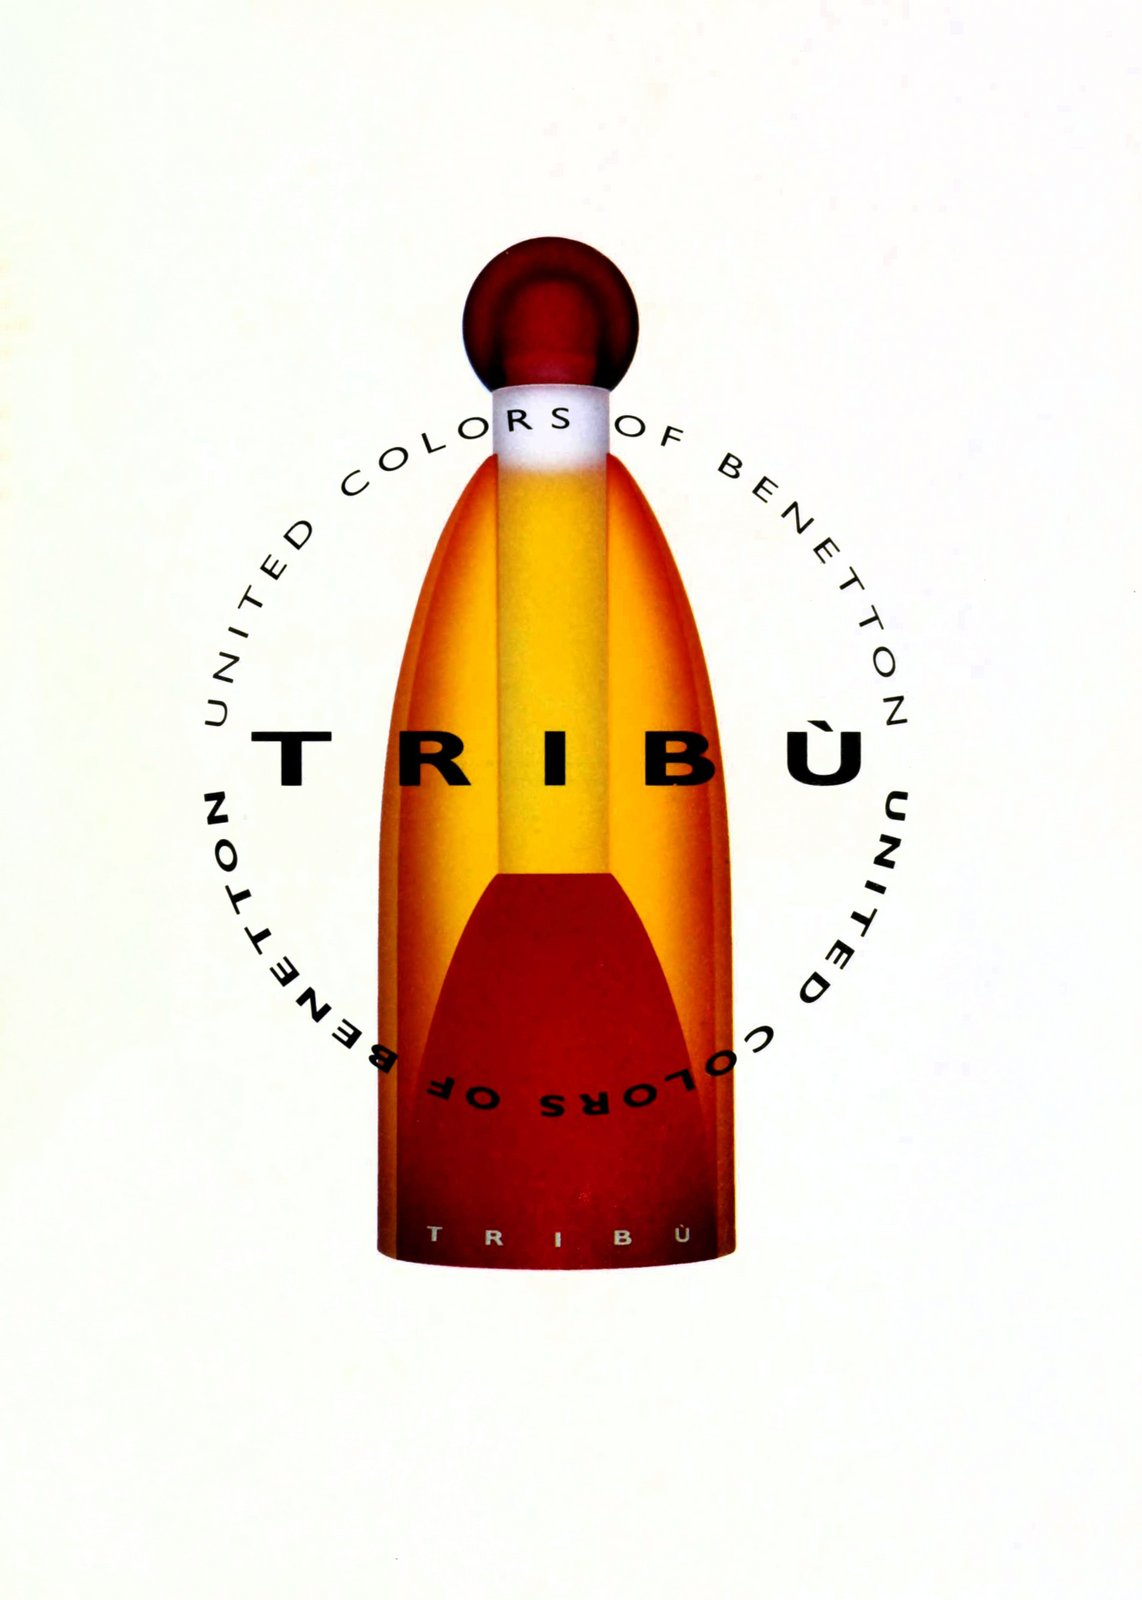 Tribu from Benetton (1993) at ClickAmericana.com